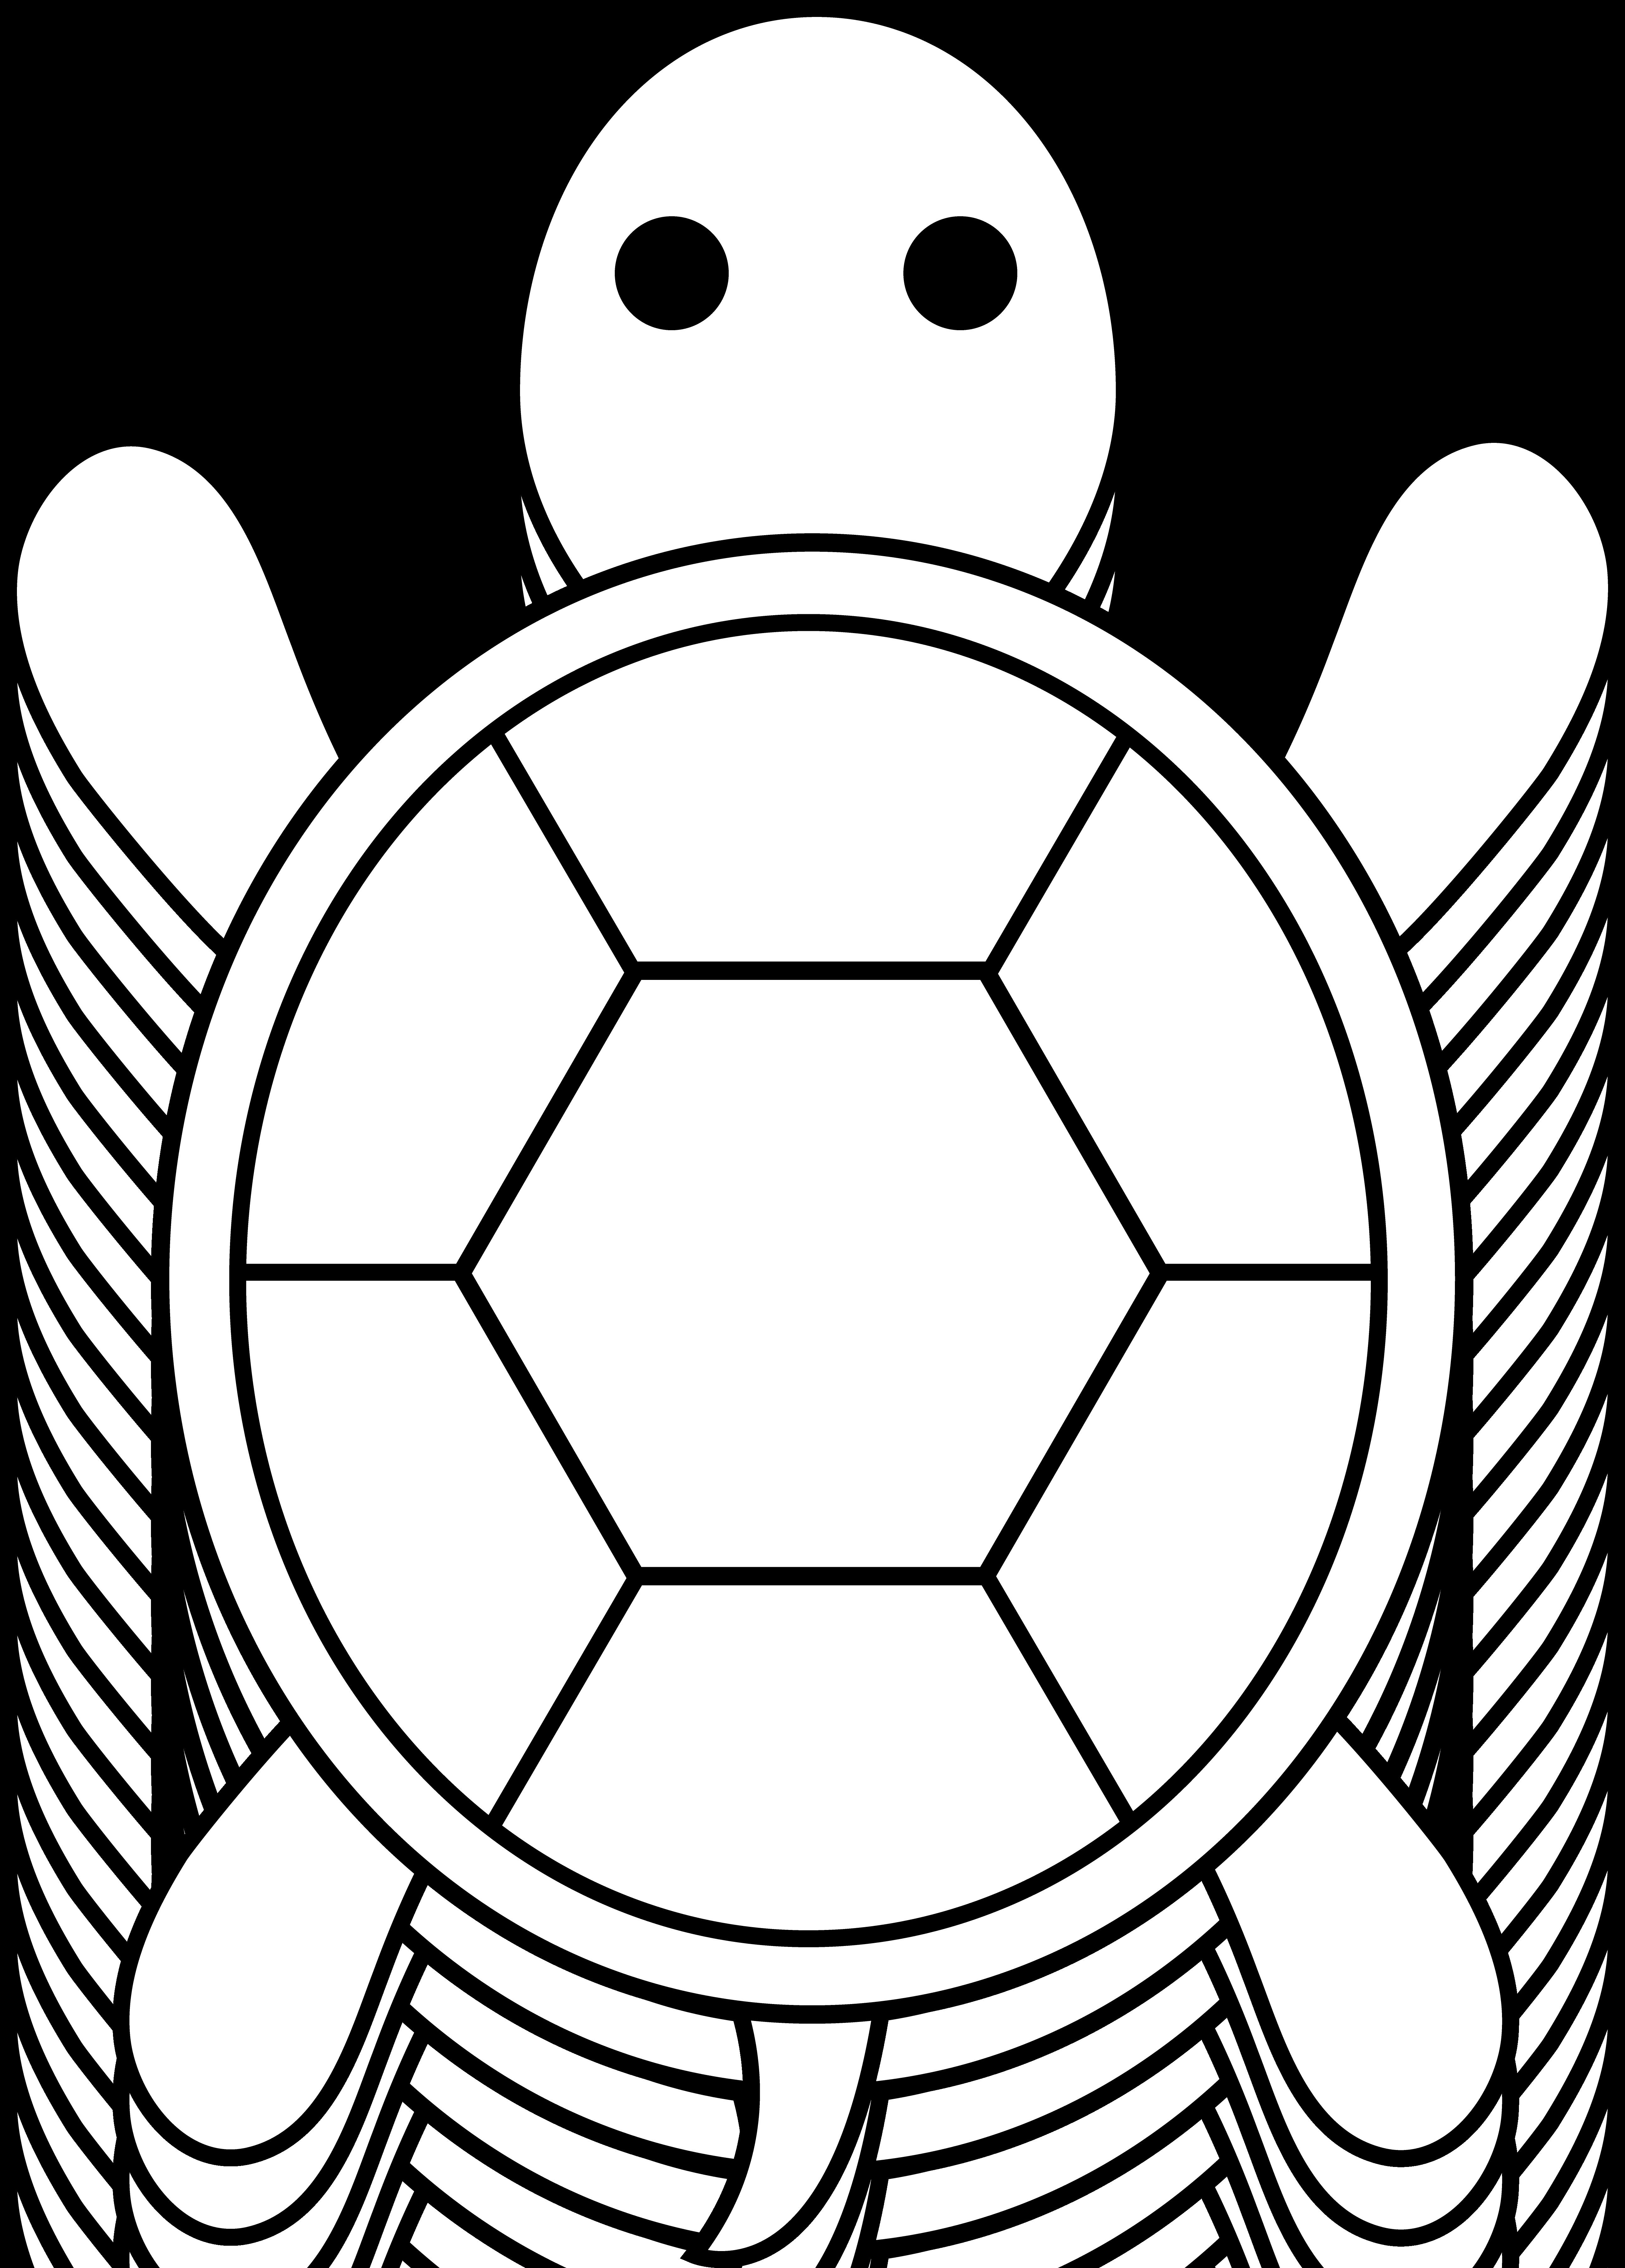 5178x7226 Cute Colorable Turtle